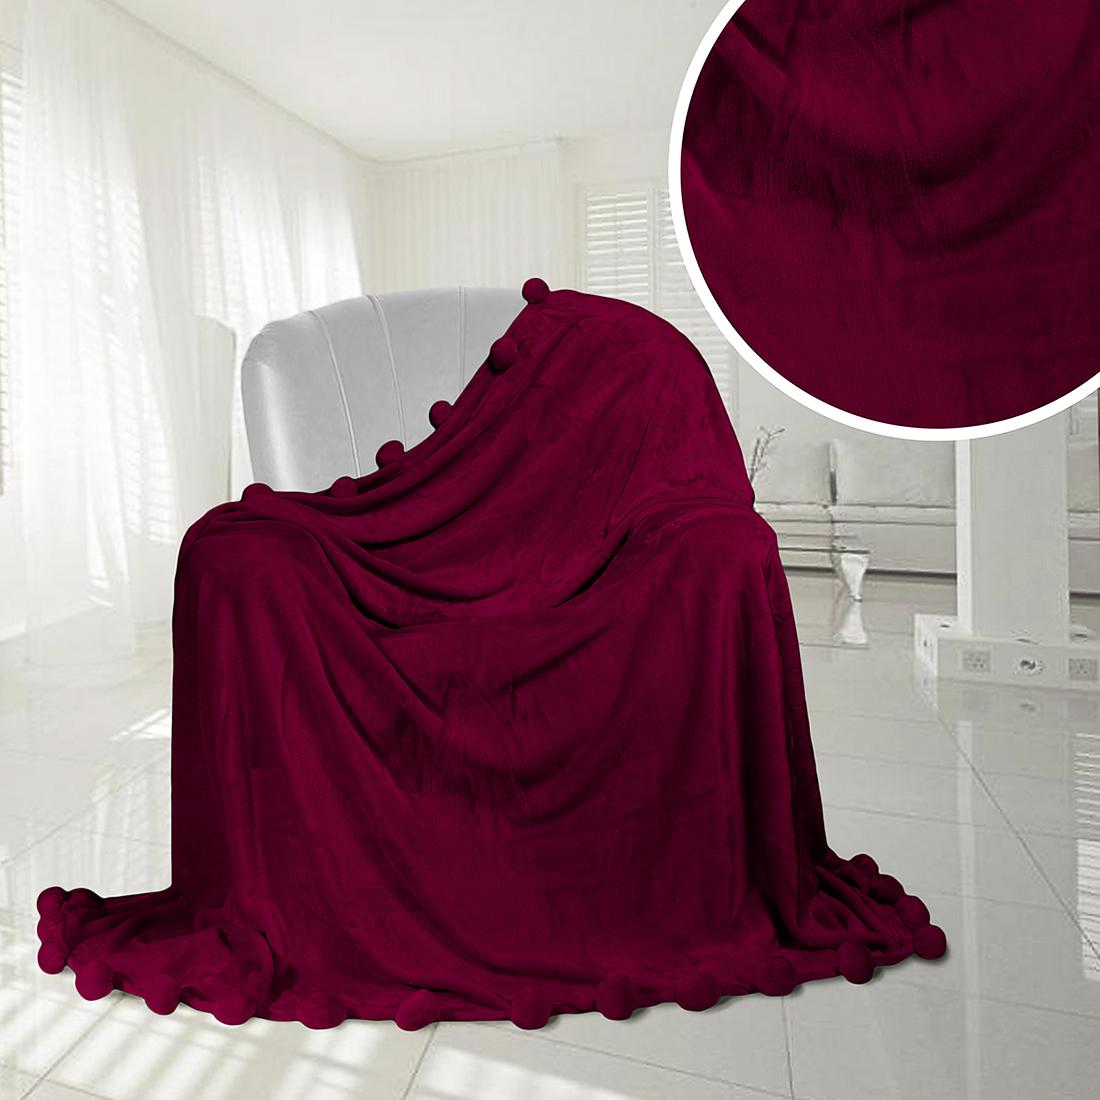 Плед Eleganta Плед Помпон Цвет: Бордовый (210х220 см) плед eleganta плед помпон цвет фиолетовый 210х220 см